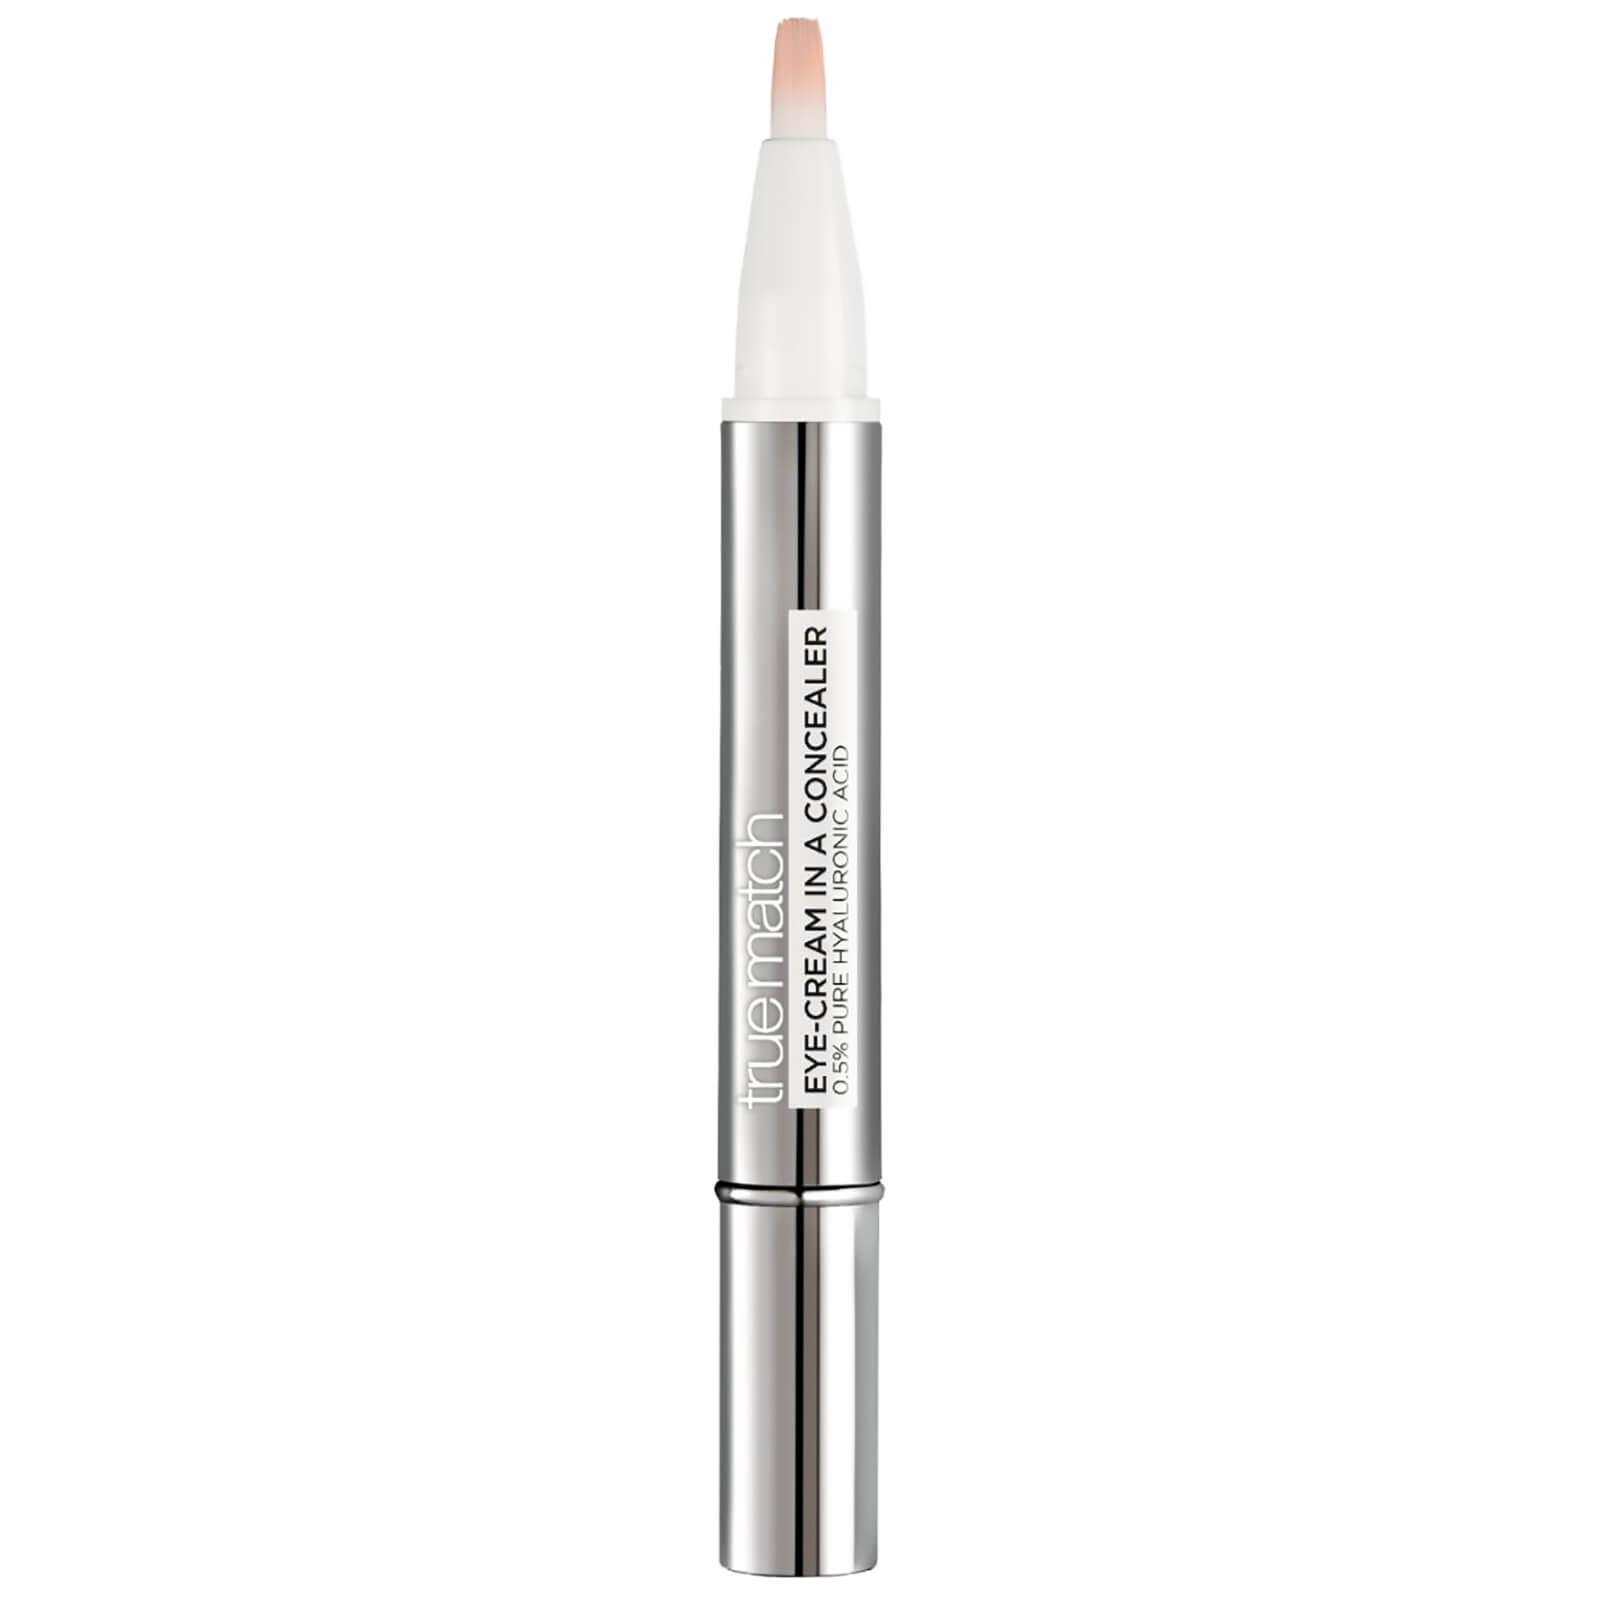 L'Oréal Paris True Match Eye Cream in a Concealer SPF20 (Various Shades) - 1-2R Rose Porcelain